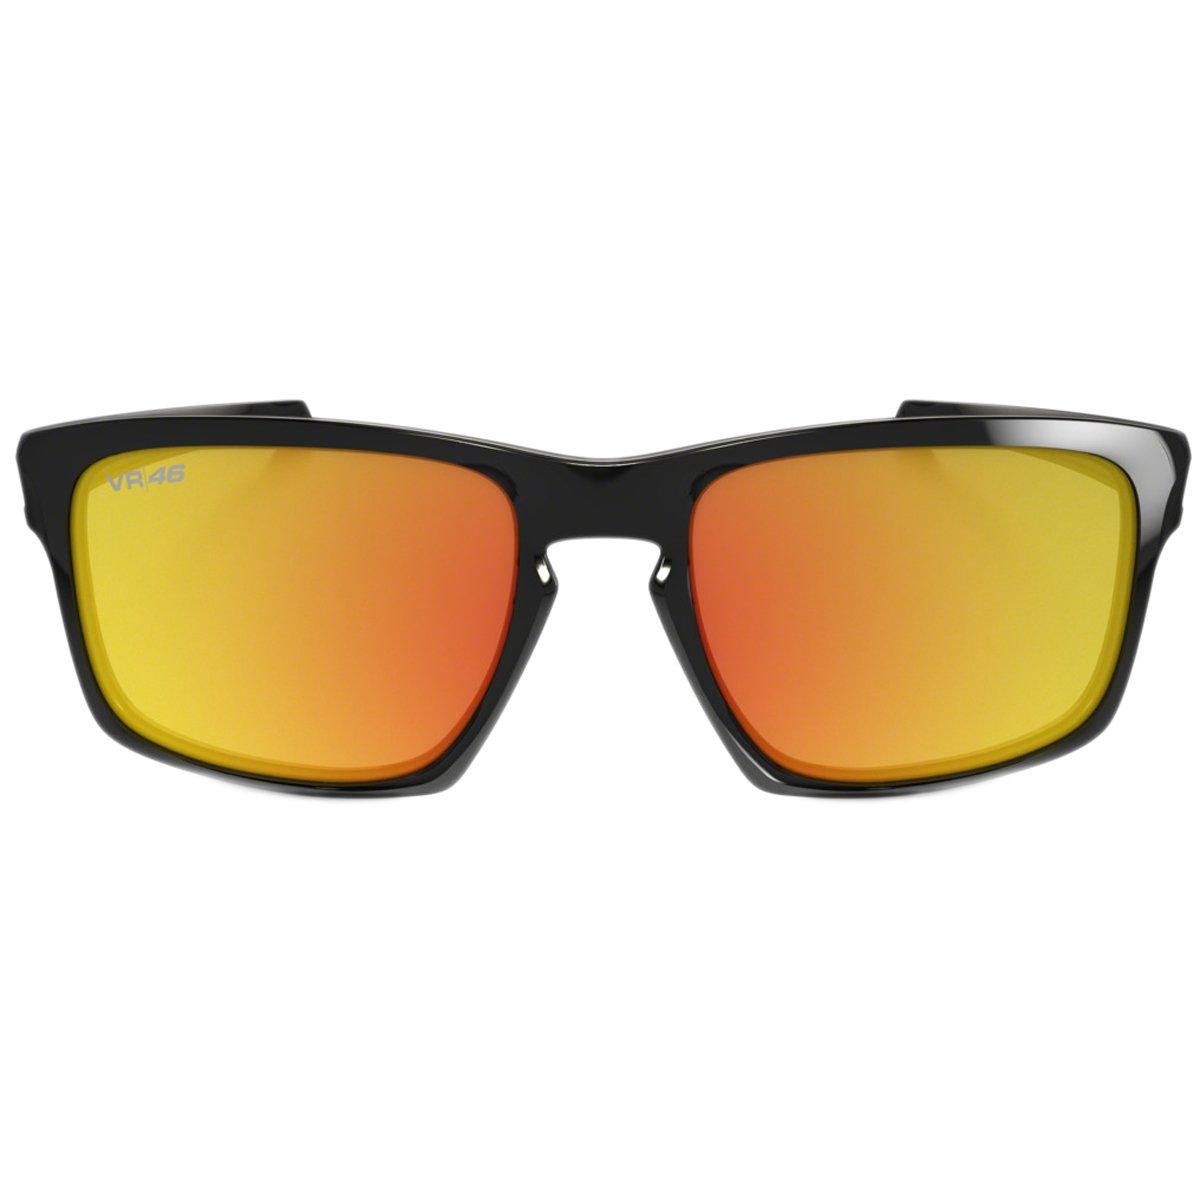 36f238b766 Amazon.com: Oakley Mens Sunglasses Black/Green - Polarized - 57mm: Clothing